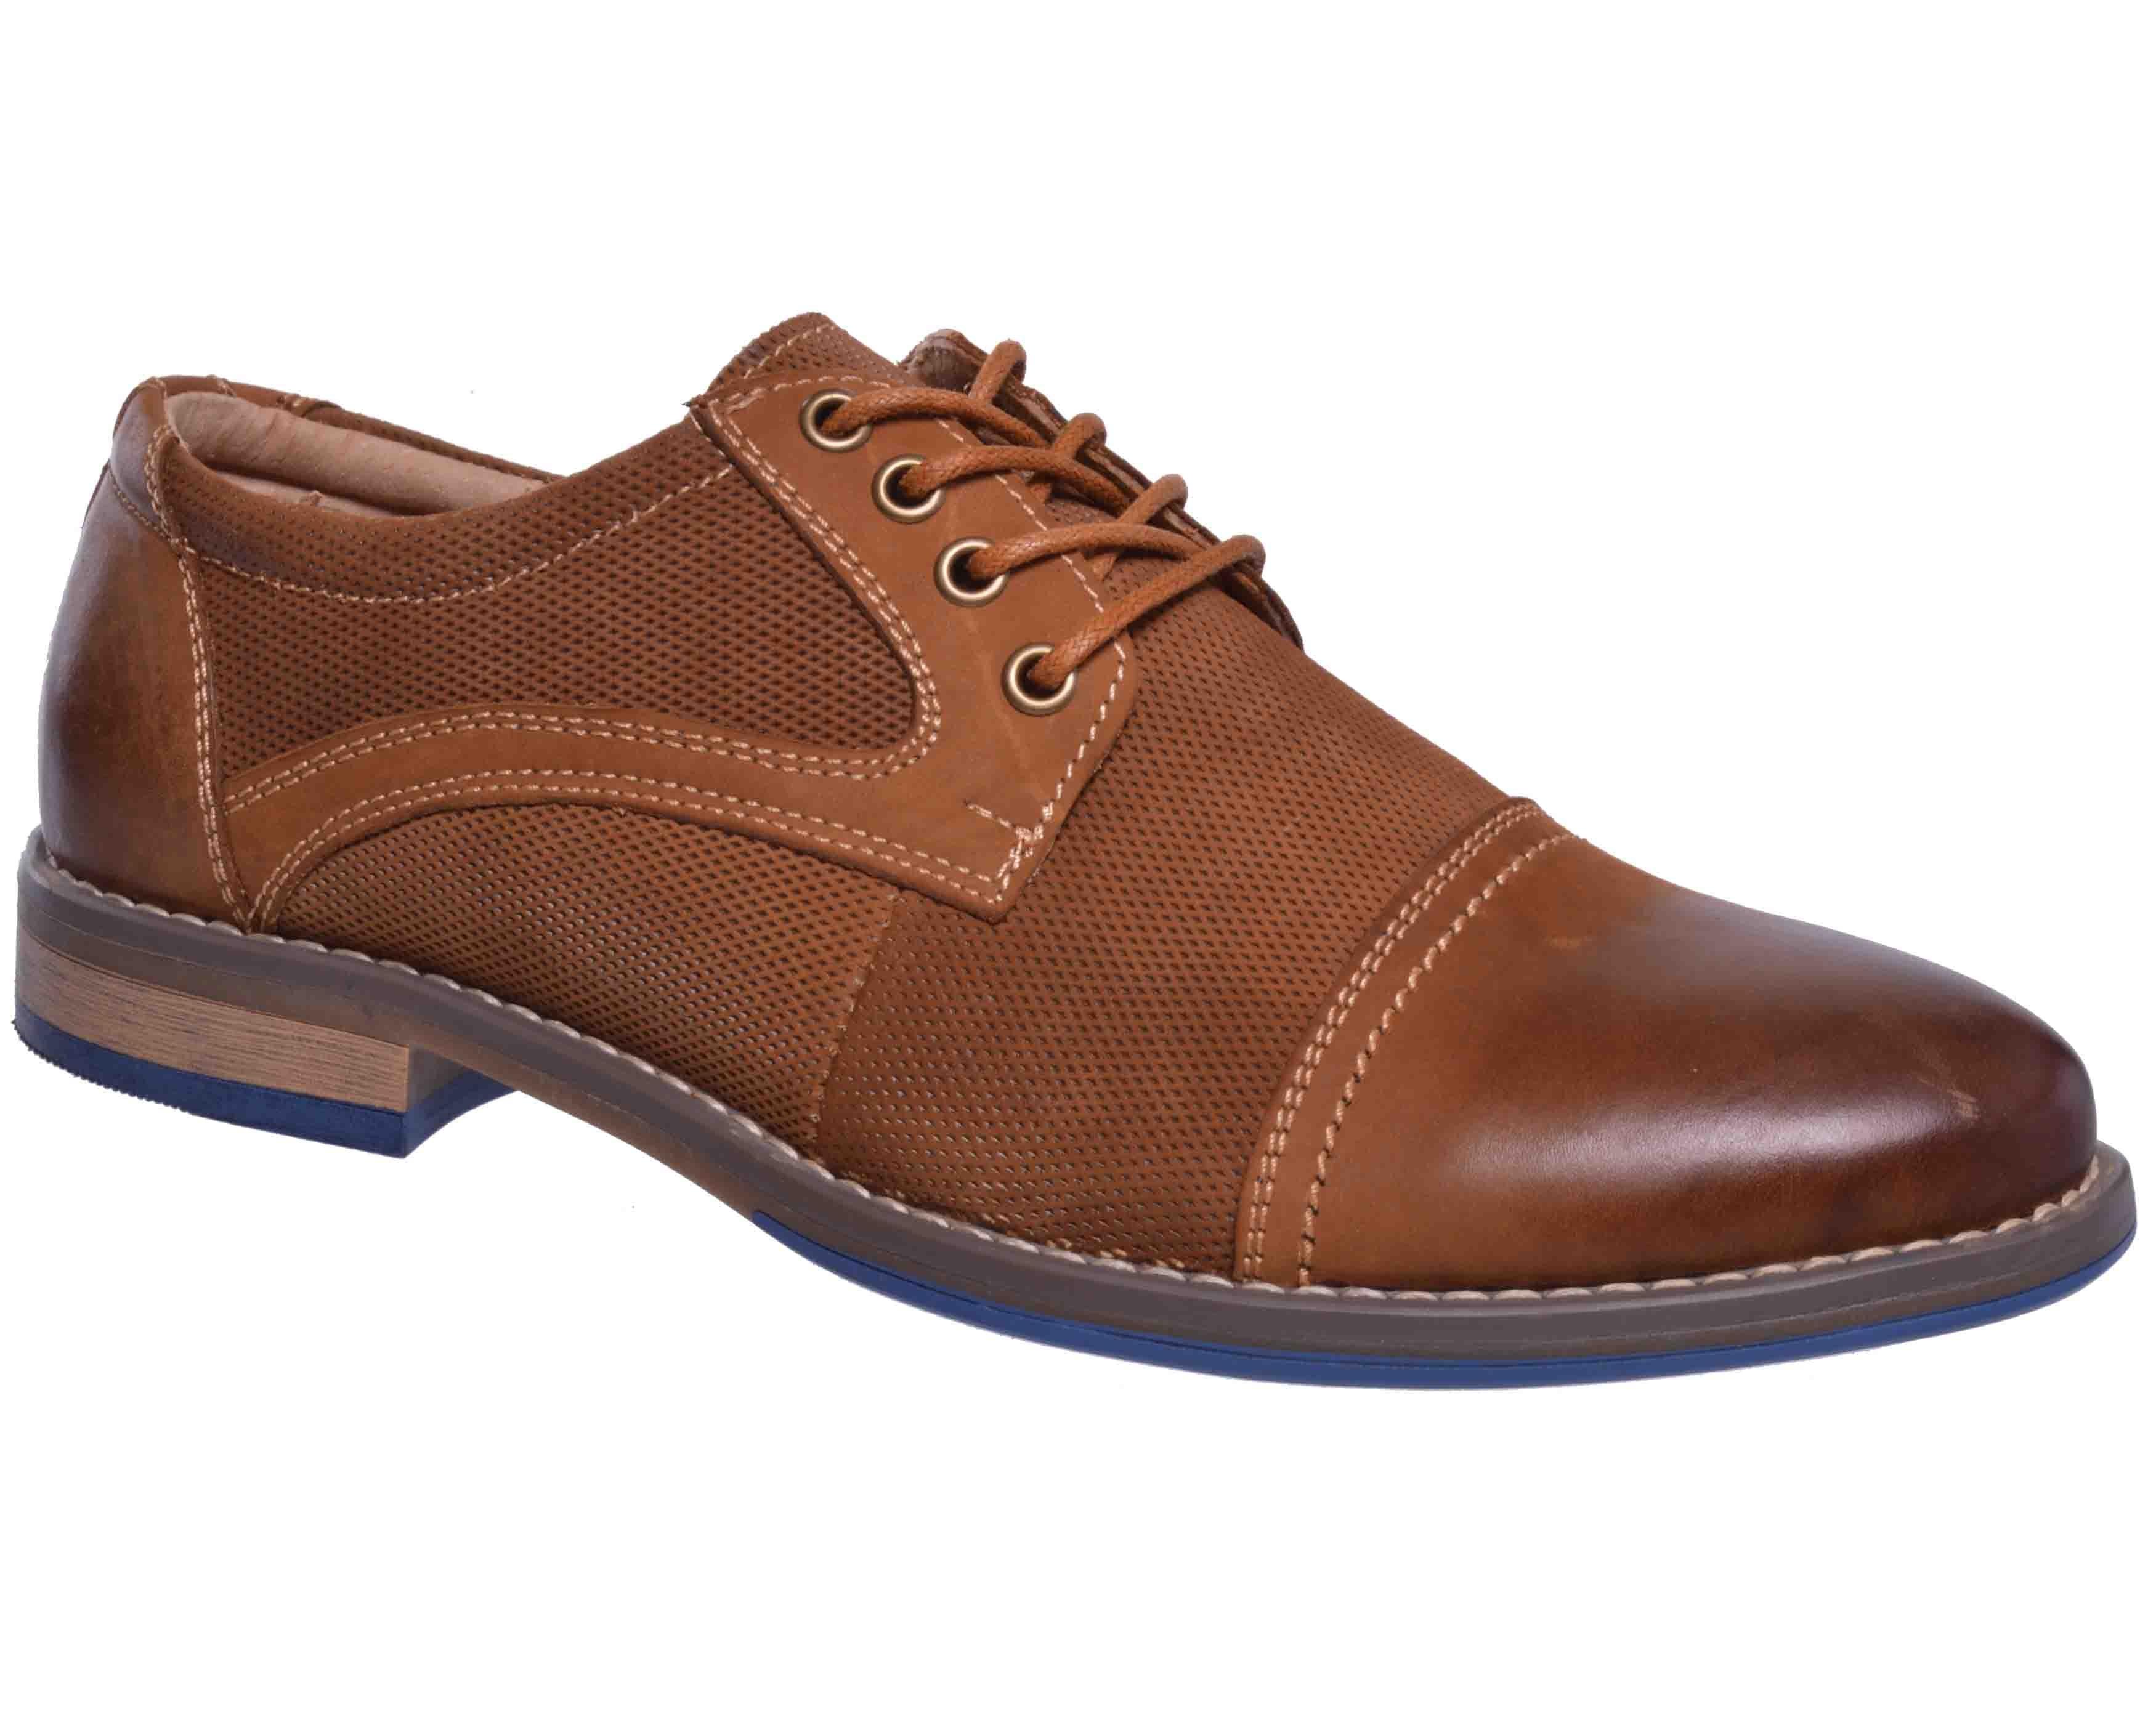 8031e0022fe Apostolidis Shoes 313113 Ταμπα | Apostolidis Shoes